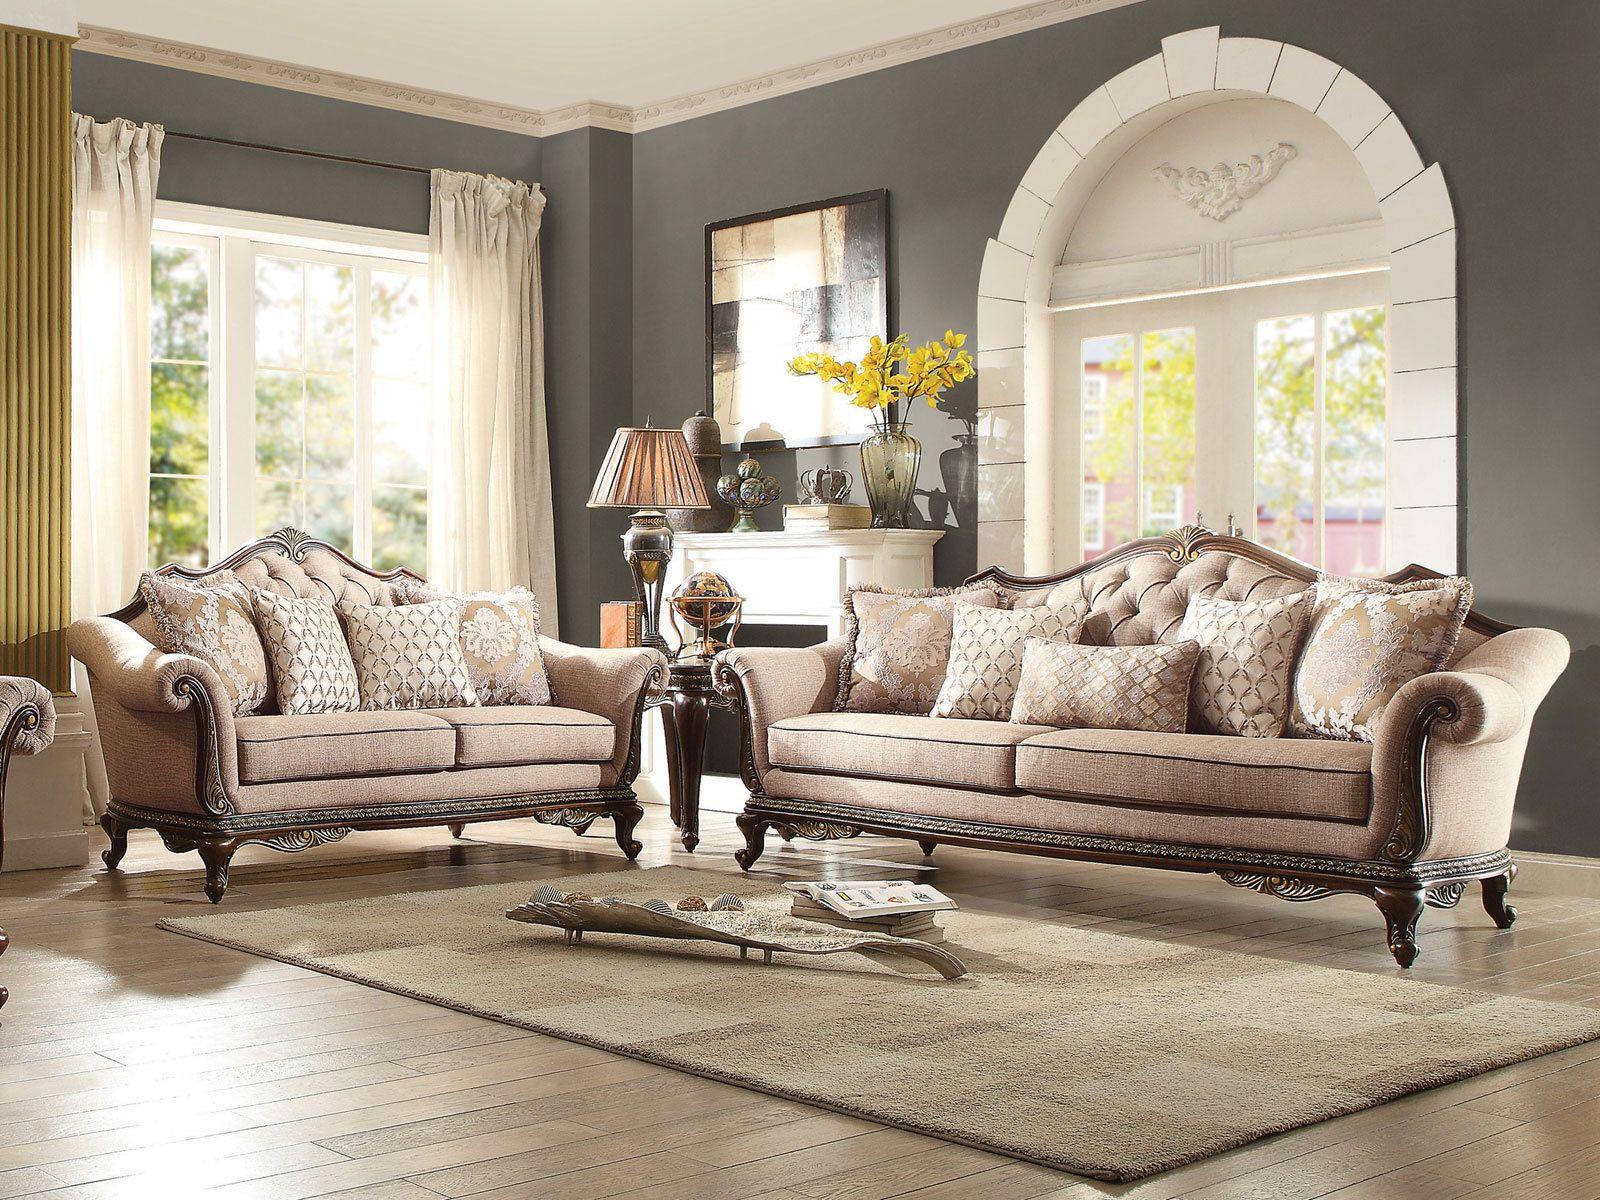 RENATA Traditional Living Room Wood Trim Brown Chenille Fabric